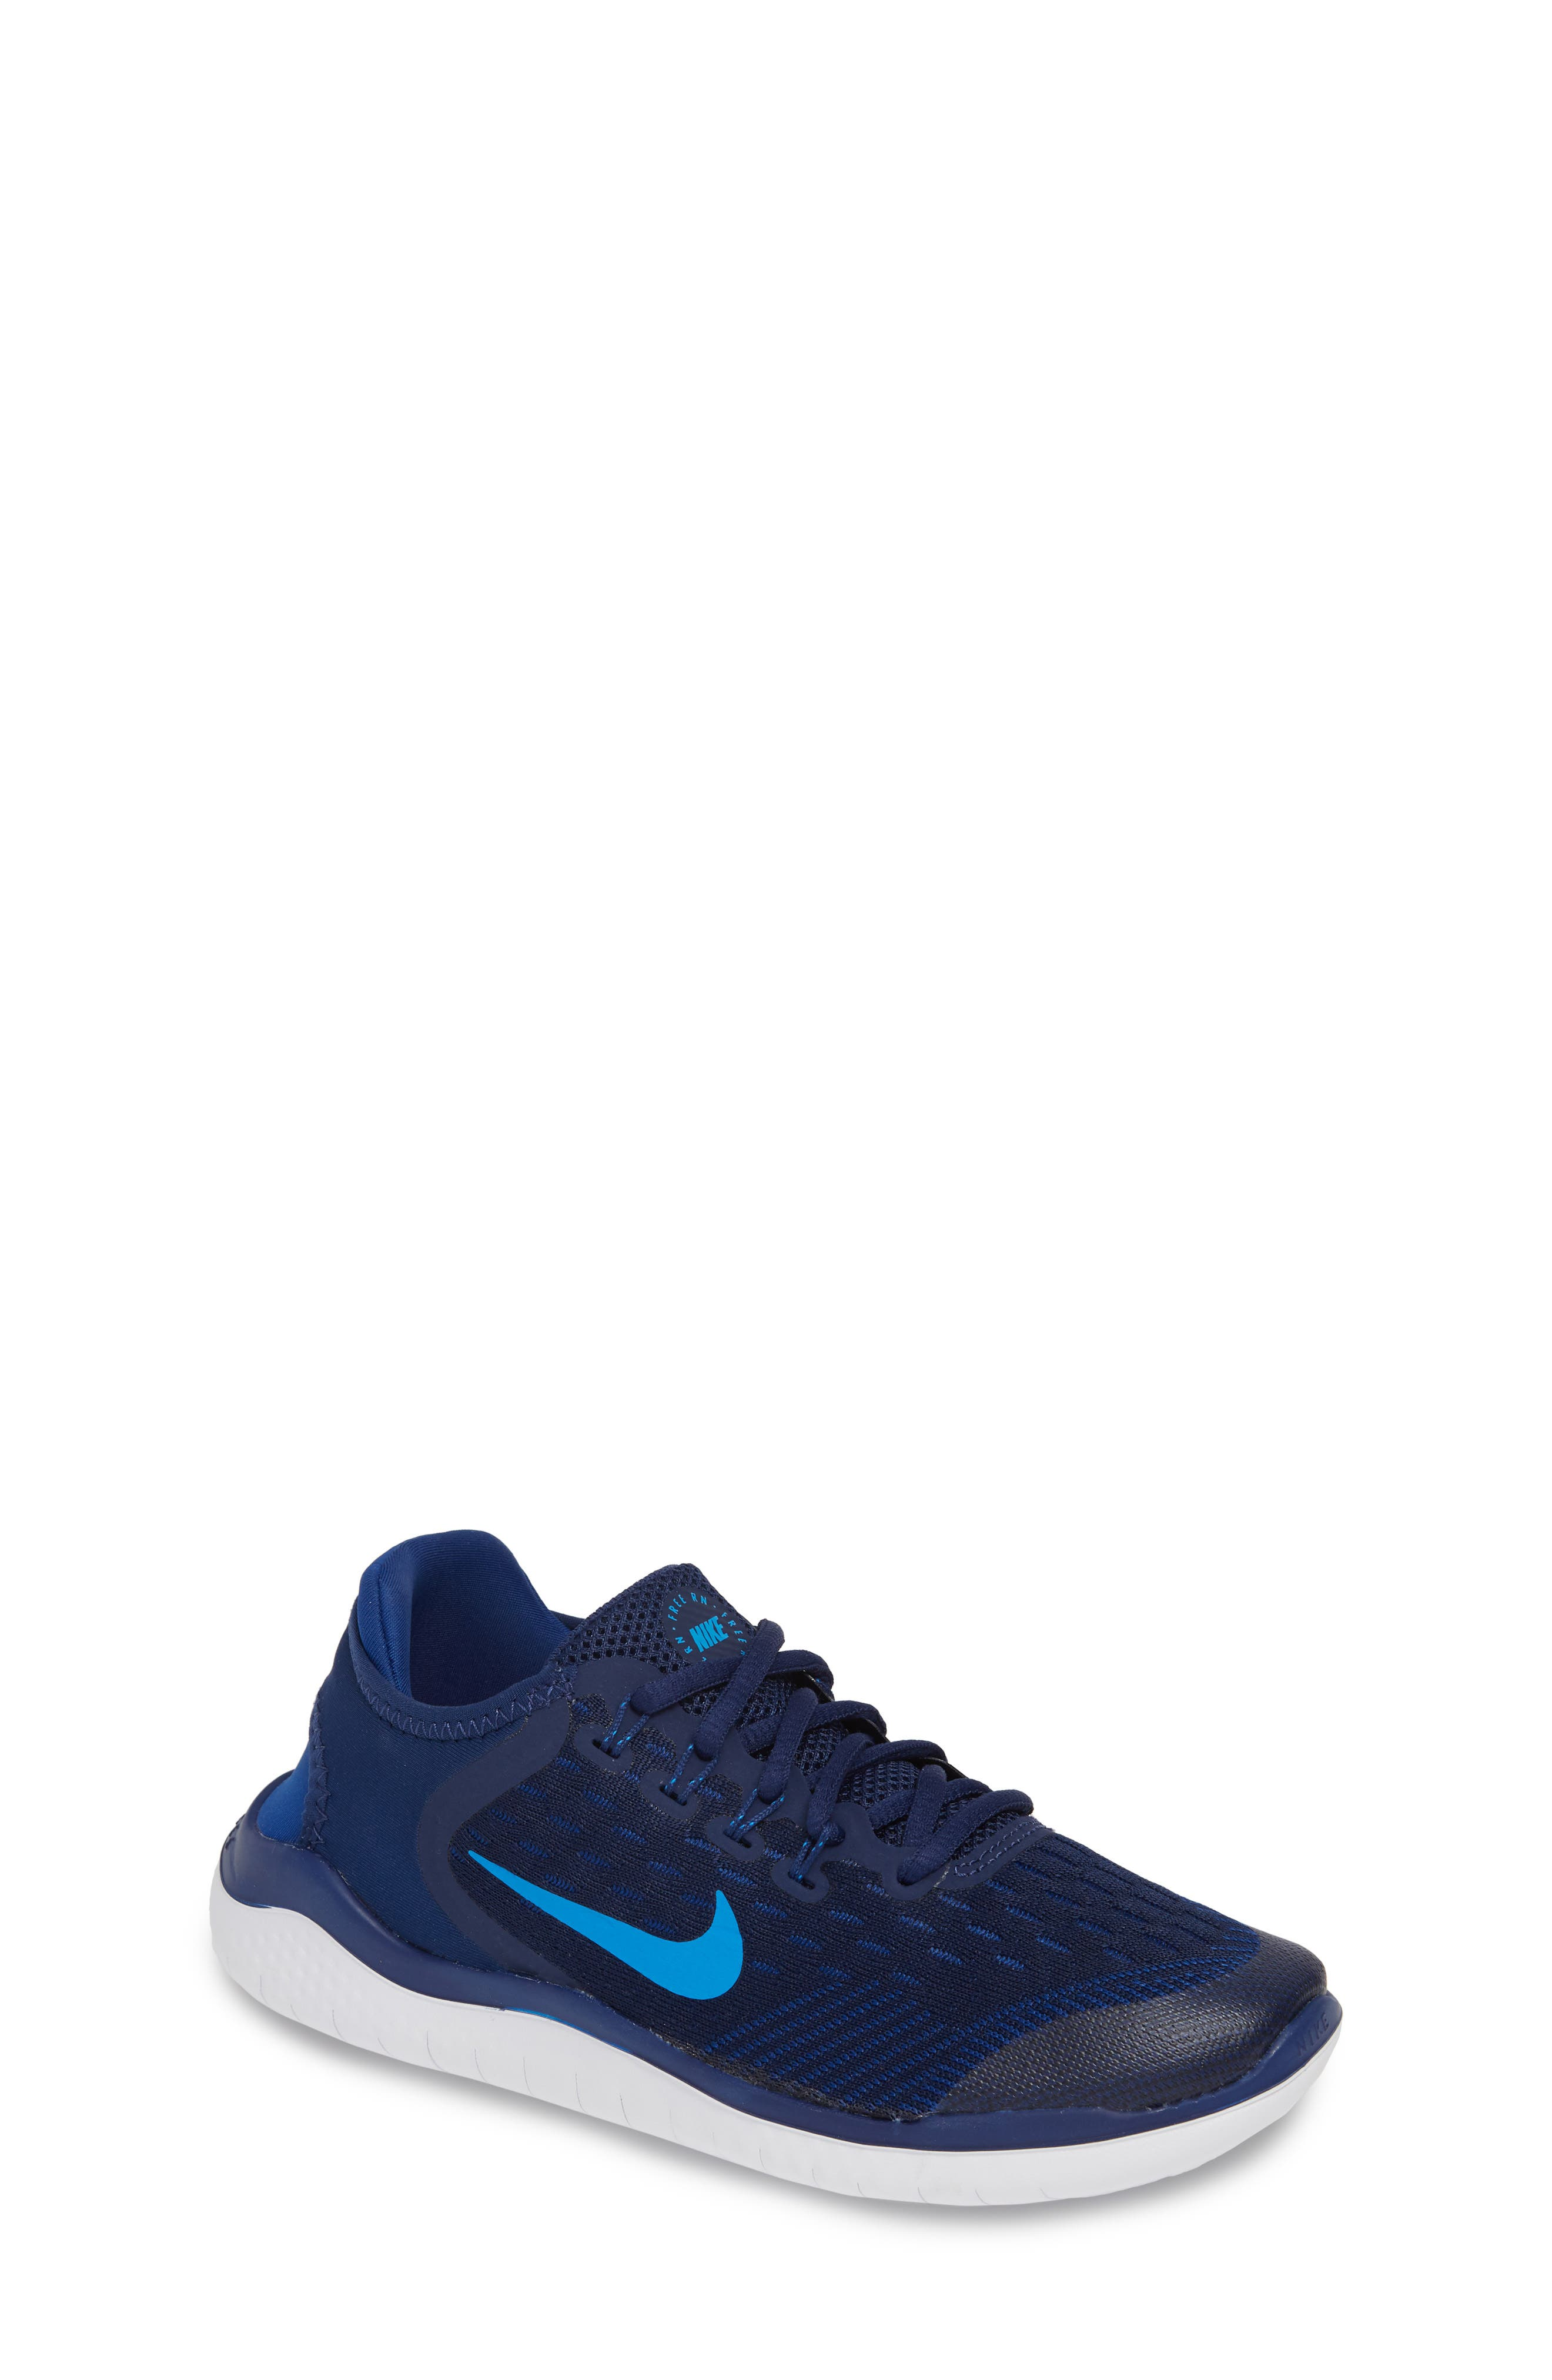 d5c965d2d8f5 Nike Free Run